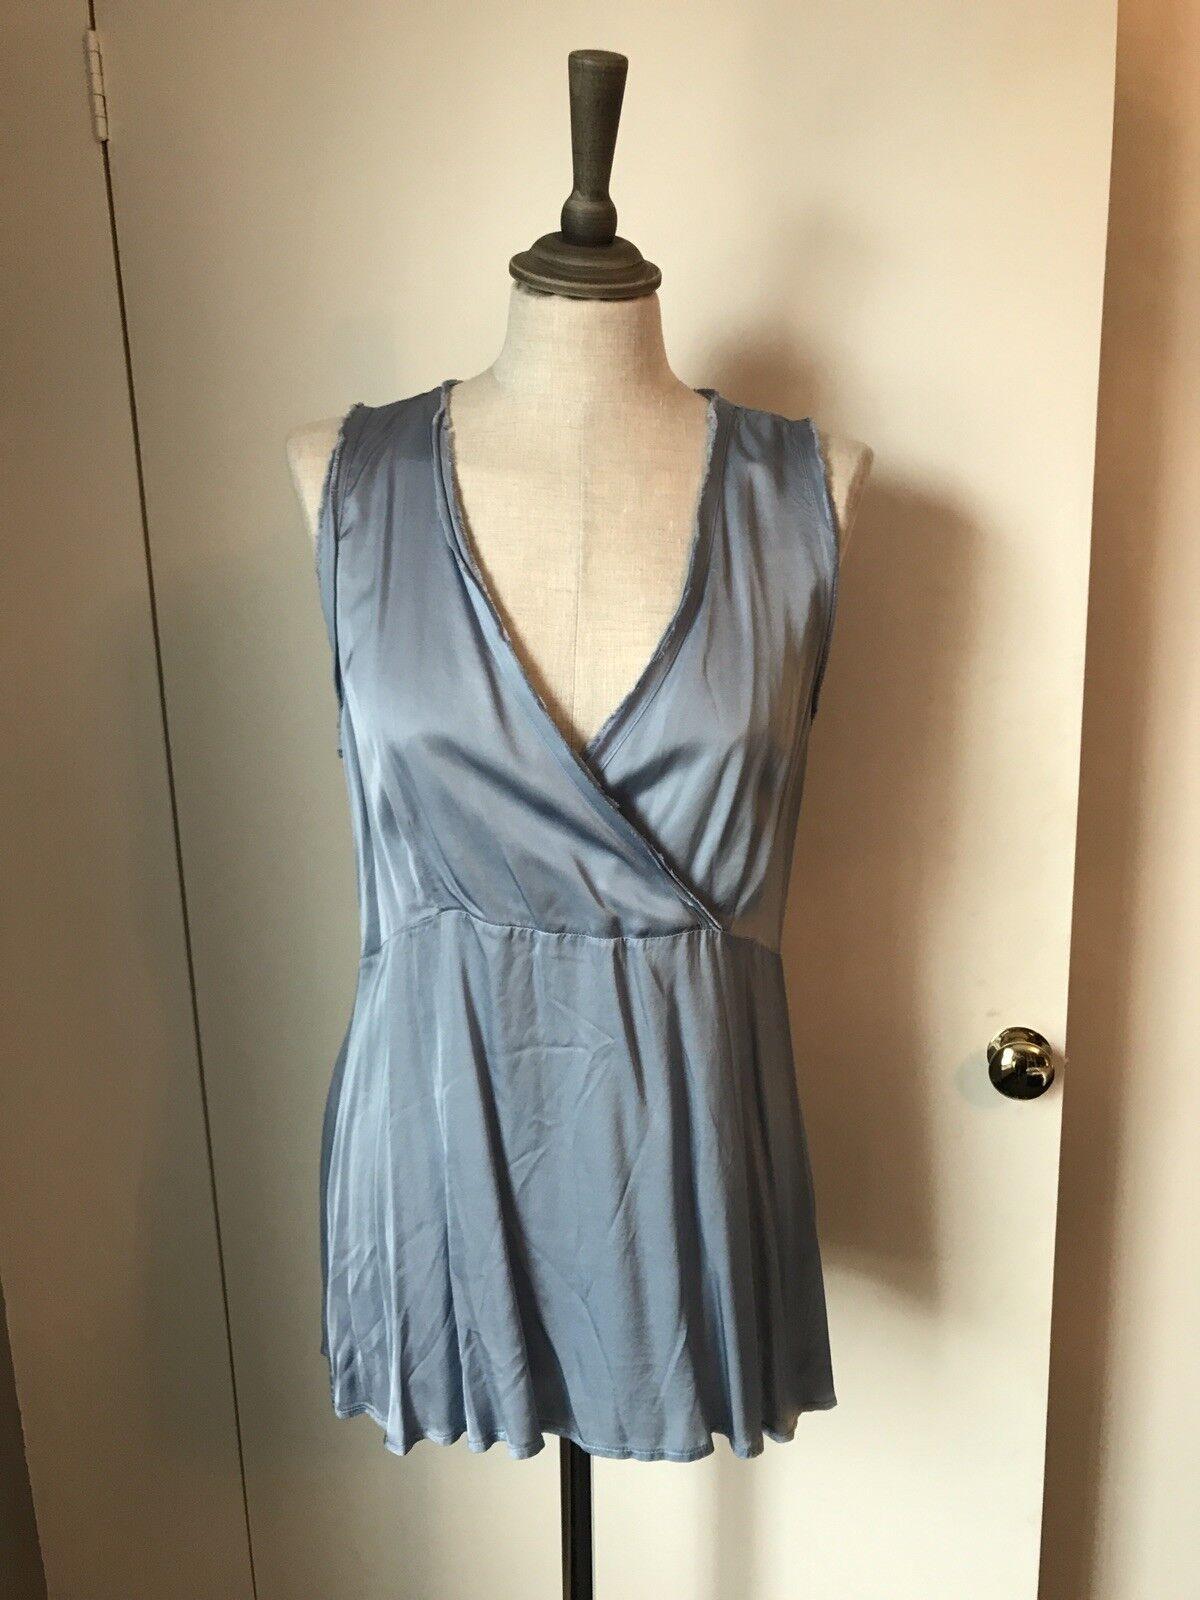 Lauren Vidal Beautiful bluee Silky Top Small BNWT